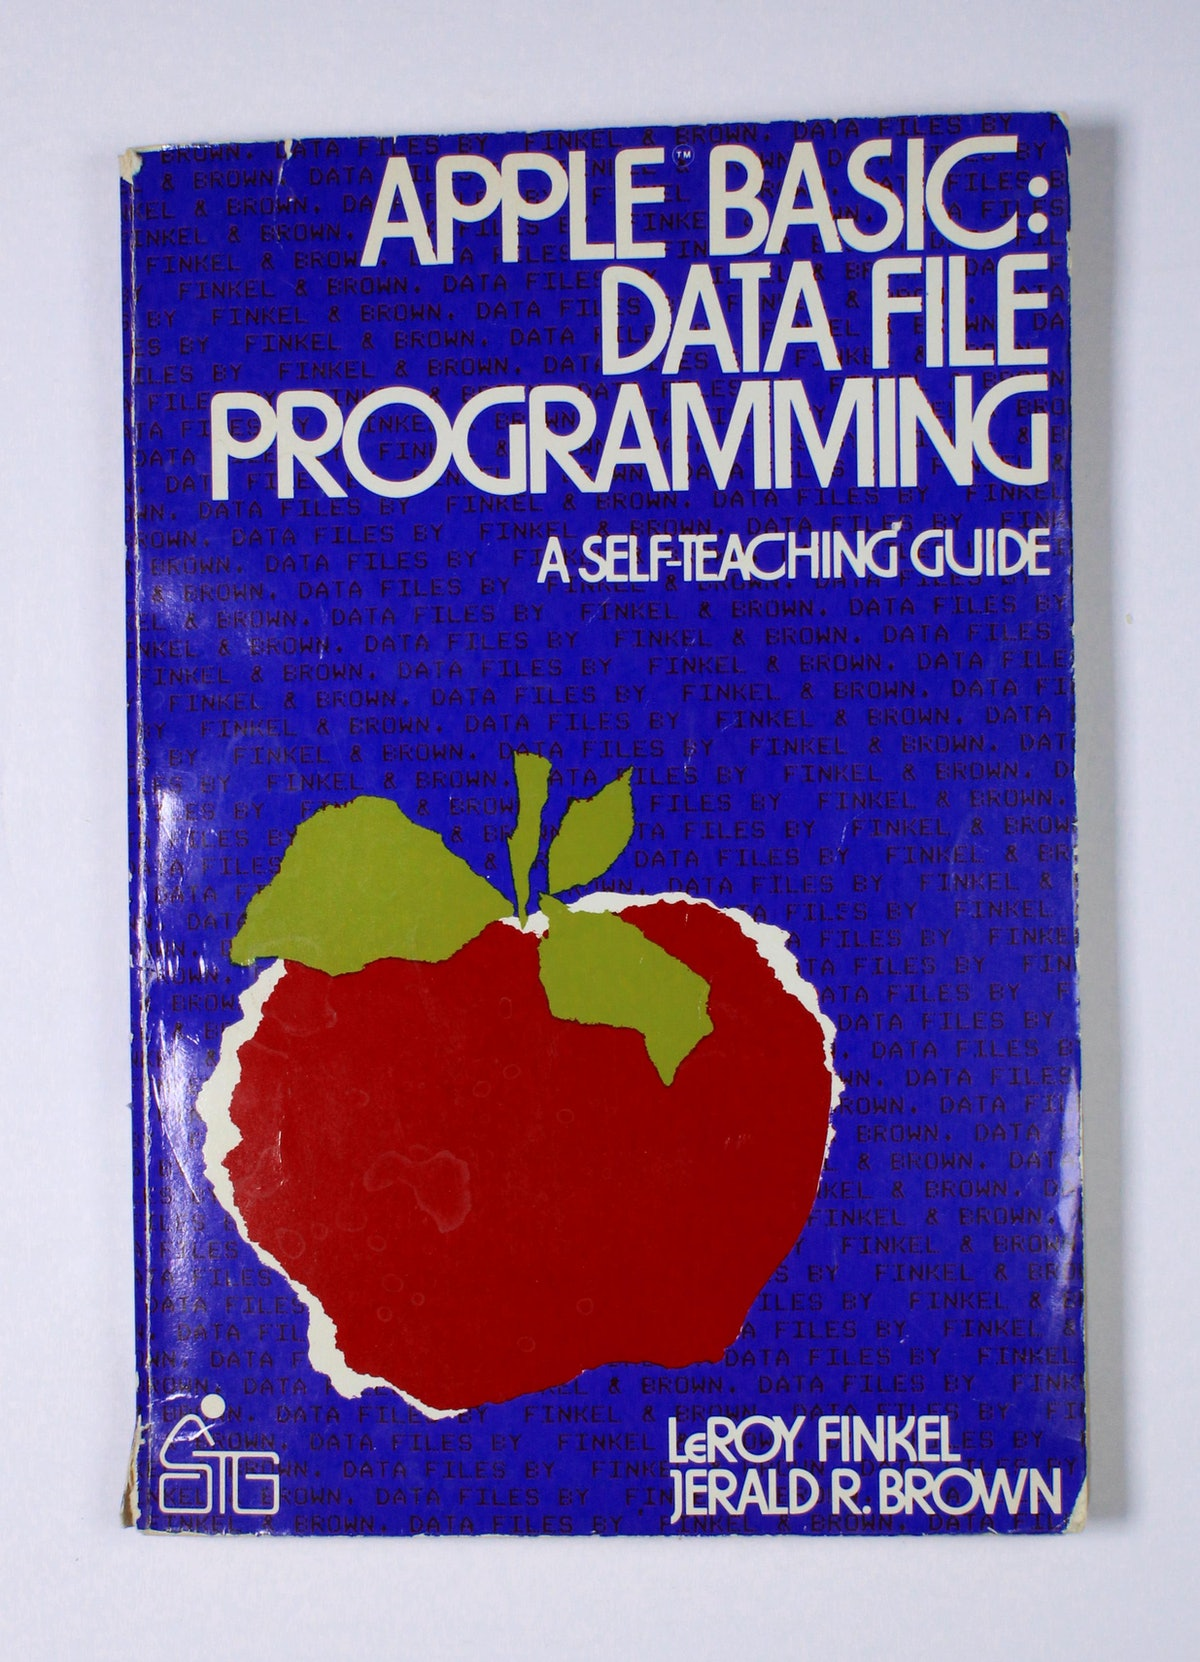 Apple BASIC: Data File Programming